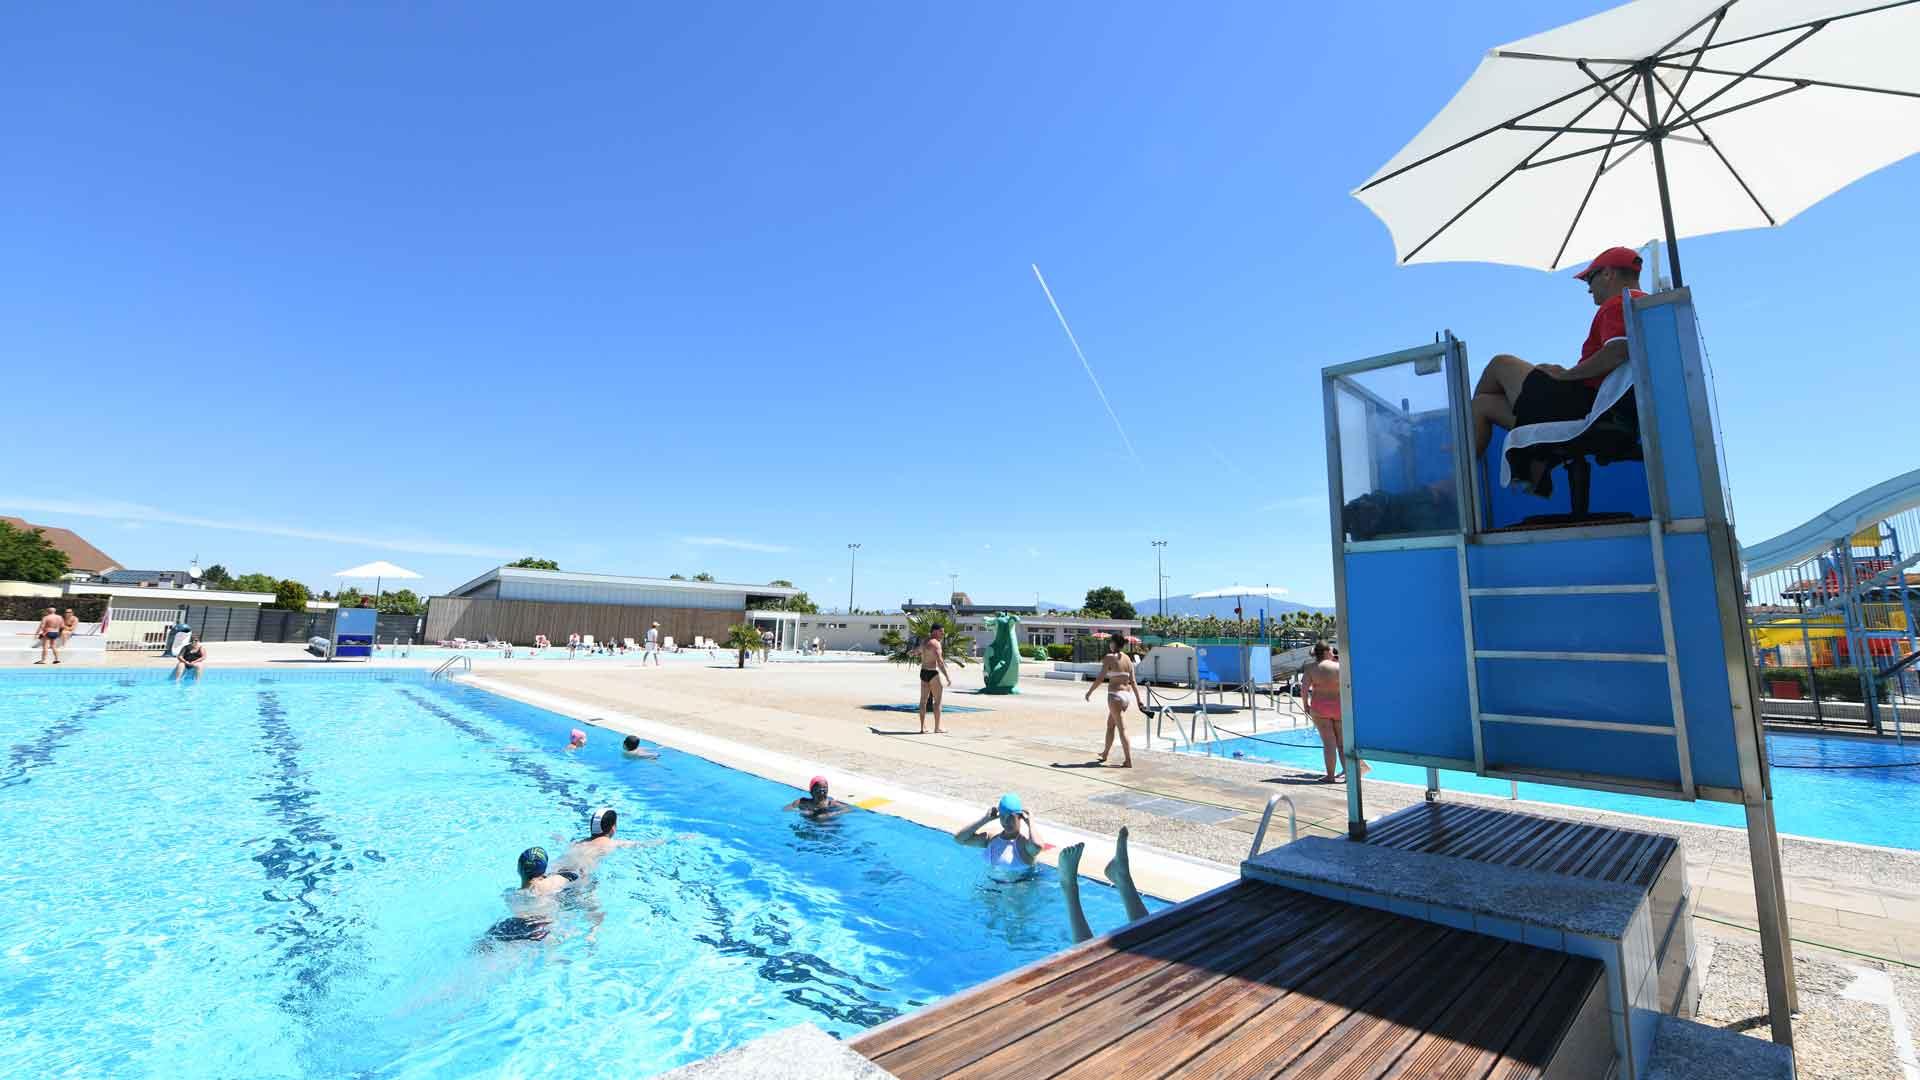 Centre Nautique Aquarhin, Piscine & Spa Ottmarsheim concernant Horaire Piscine Ottmarsheim